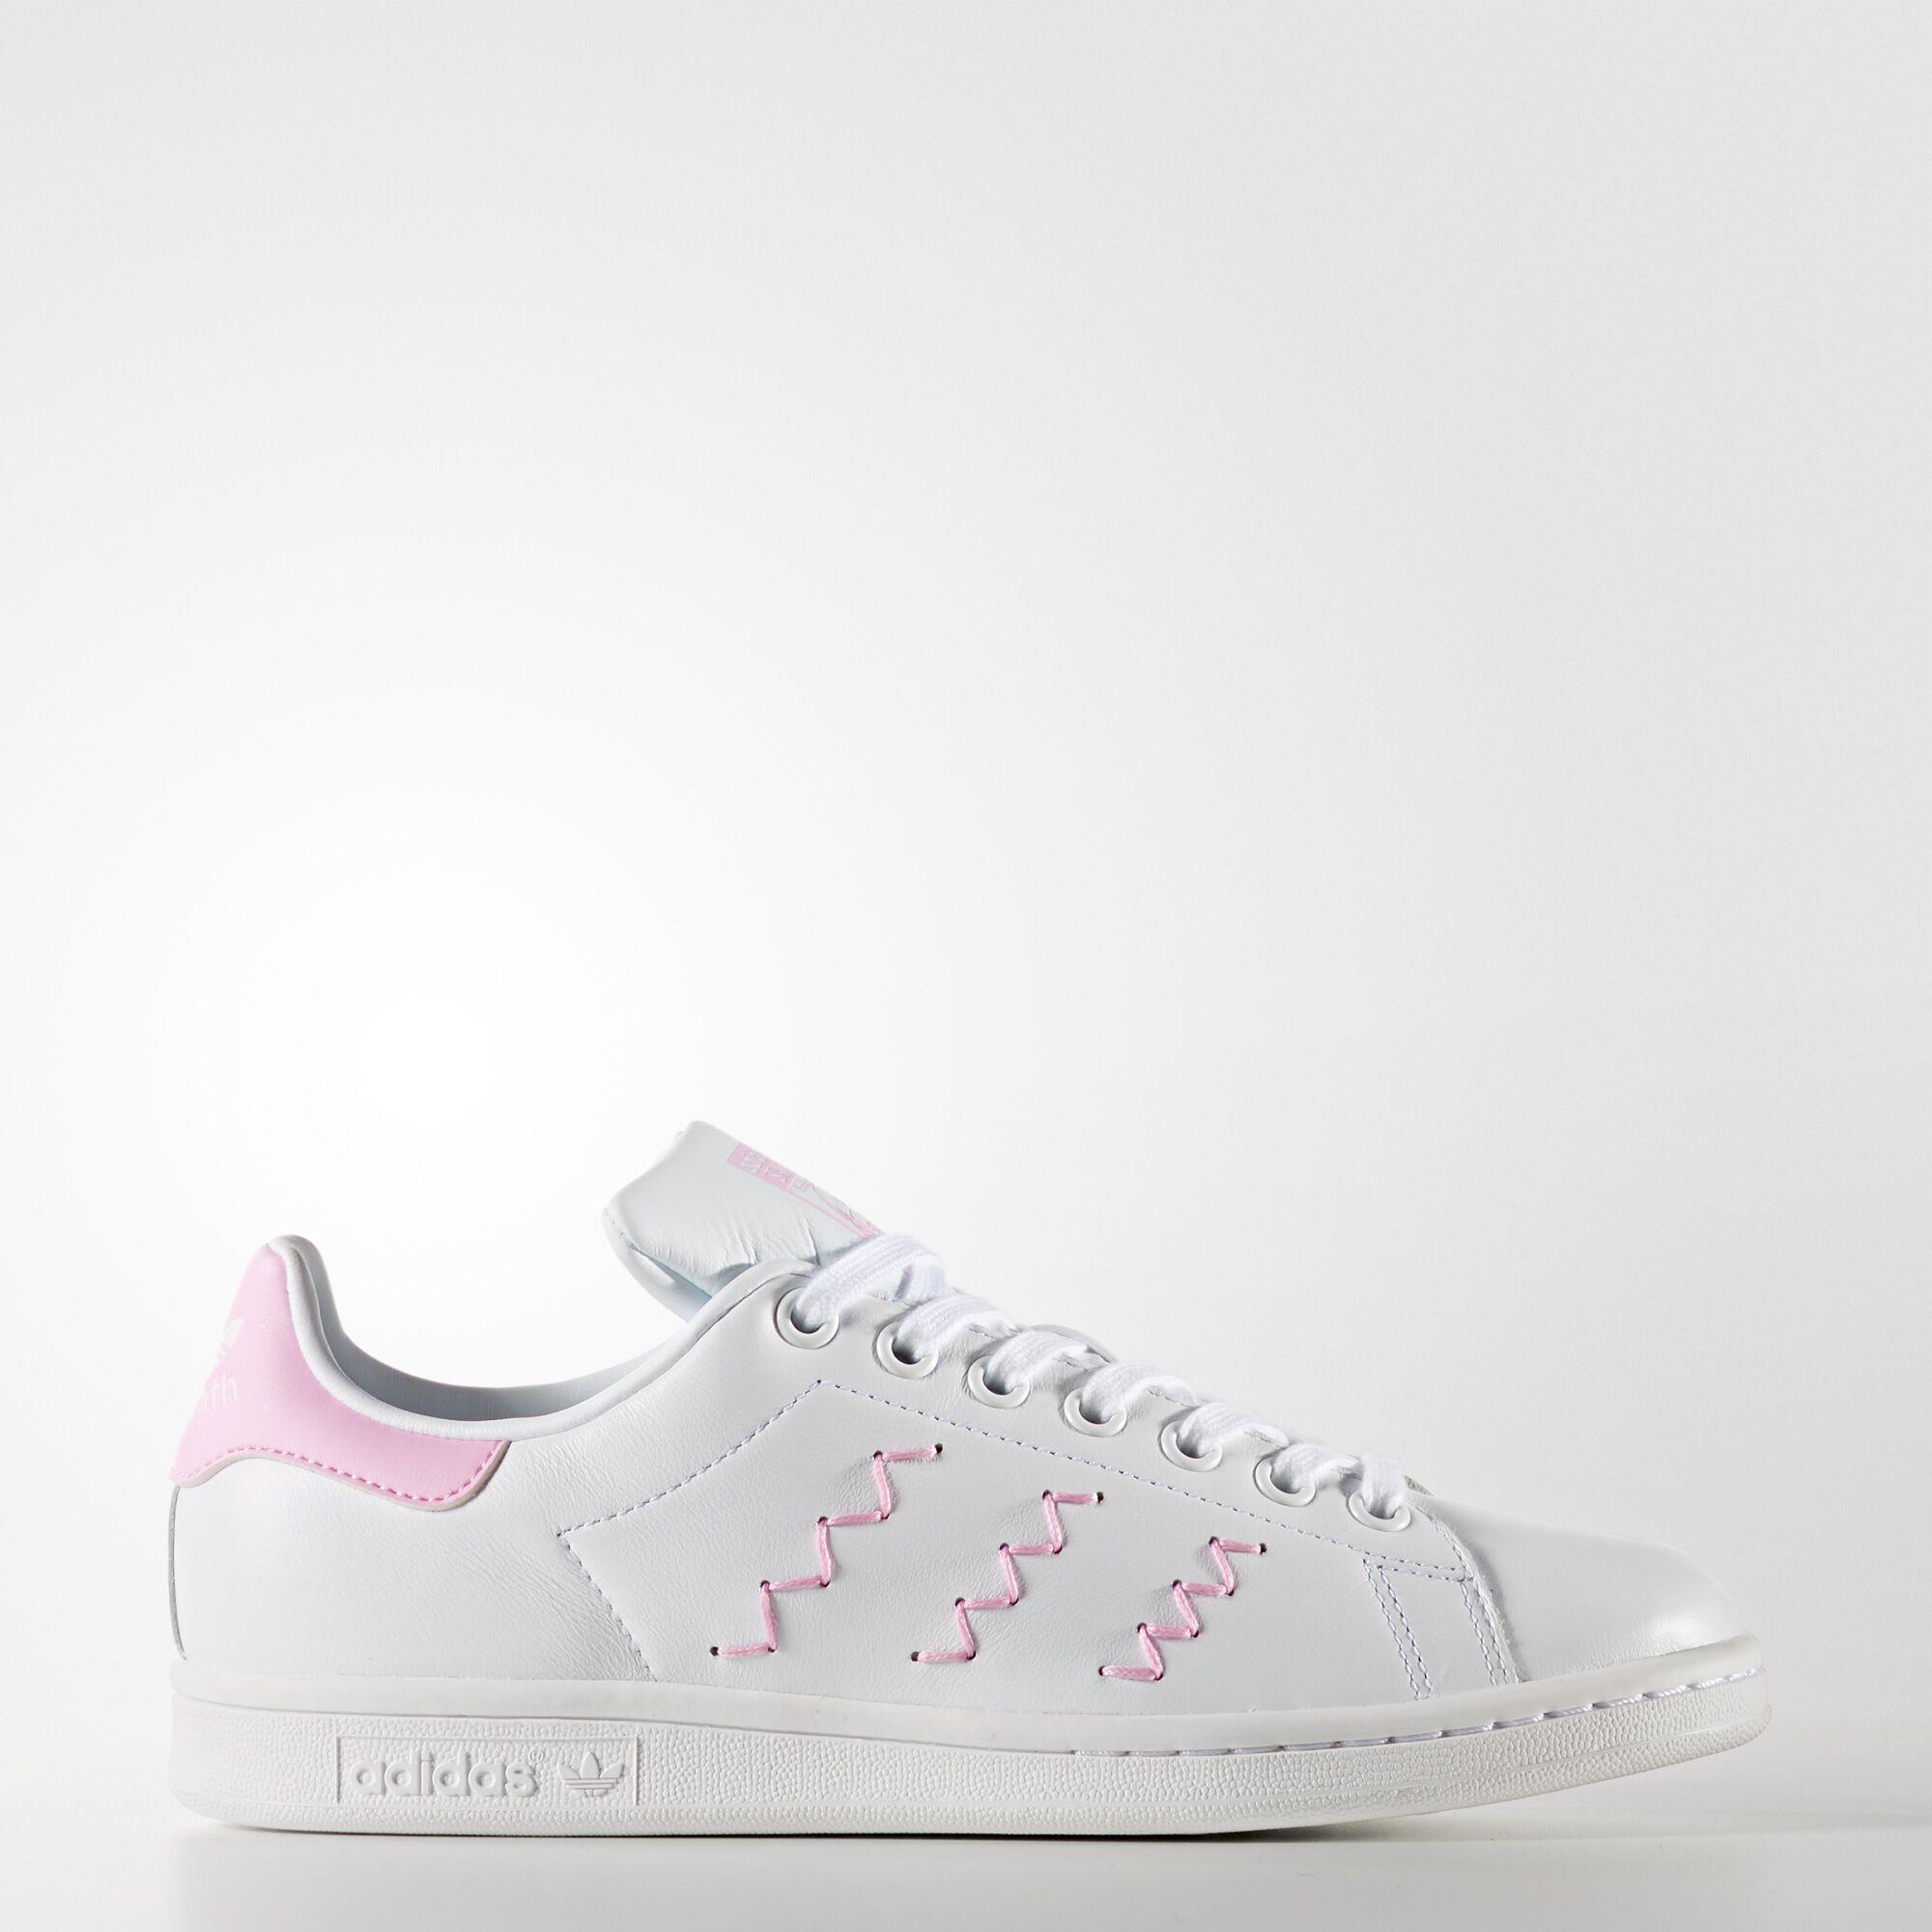 best sneakers c7e2e 4456b BZ0401 01 standard.jpg